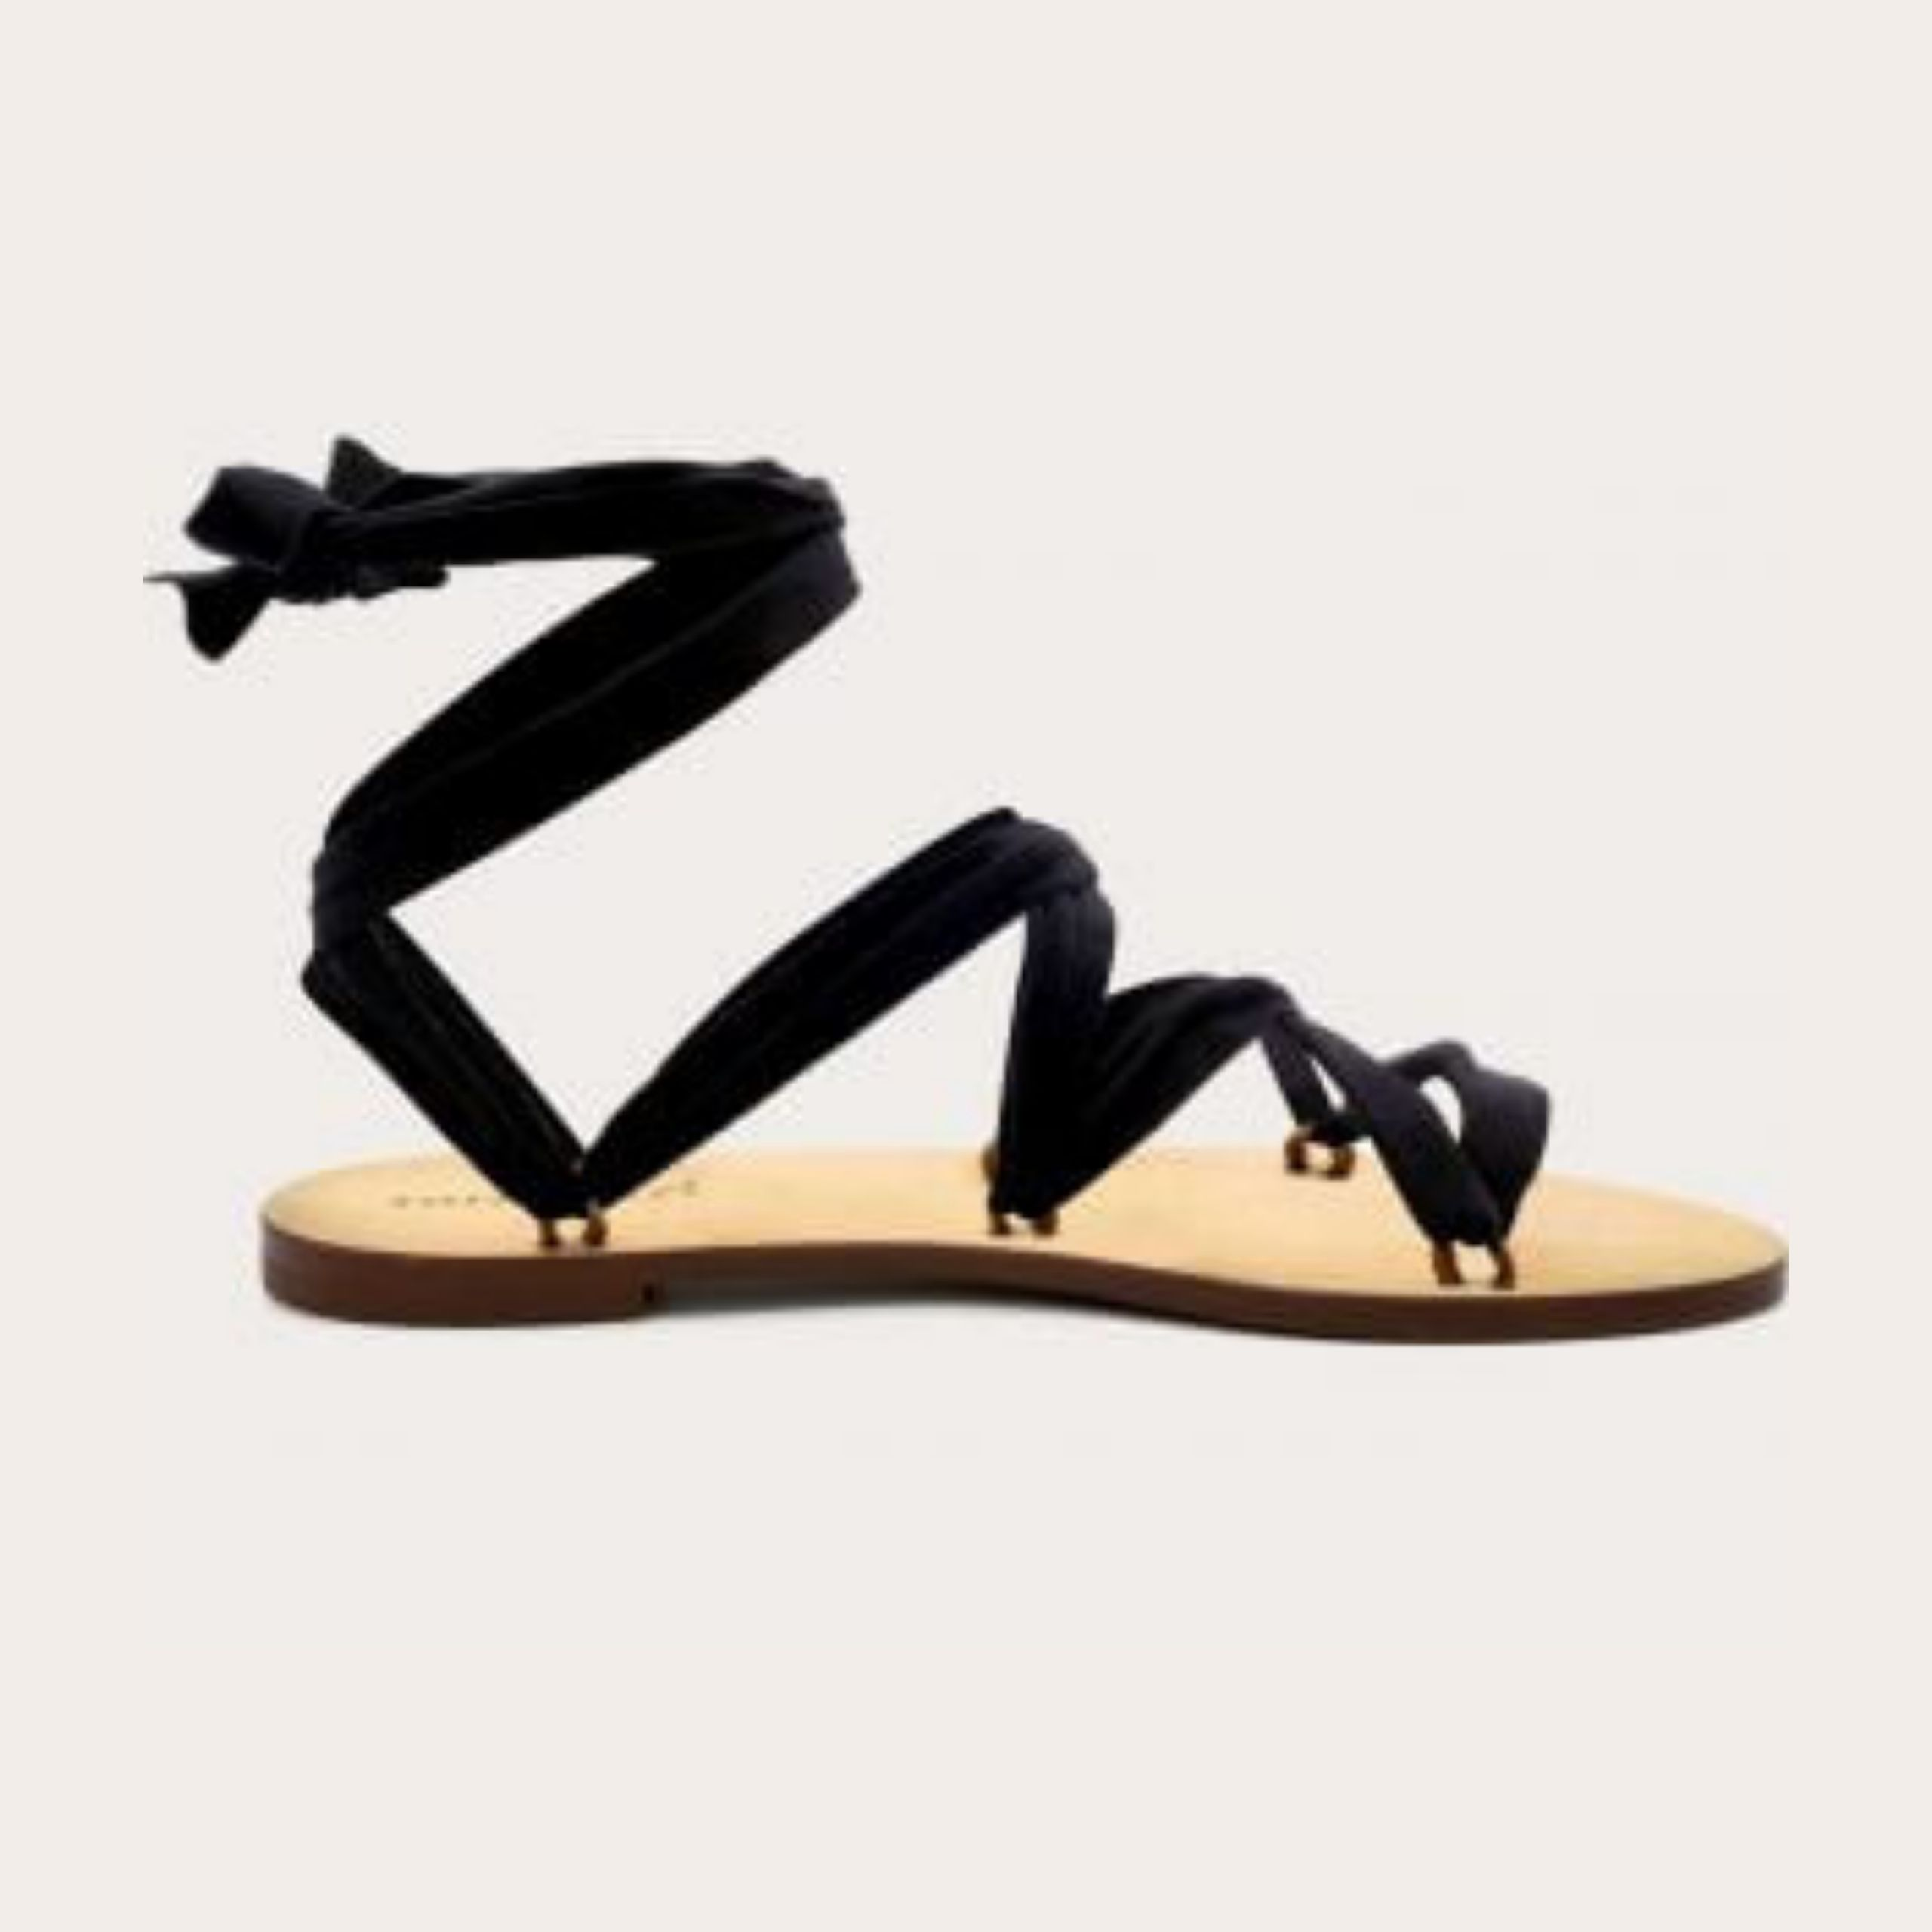 capri-1-lintsandalen sandals travelsandals vegan sustainable sandals wikkelsandalen